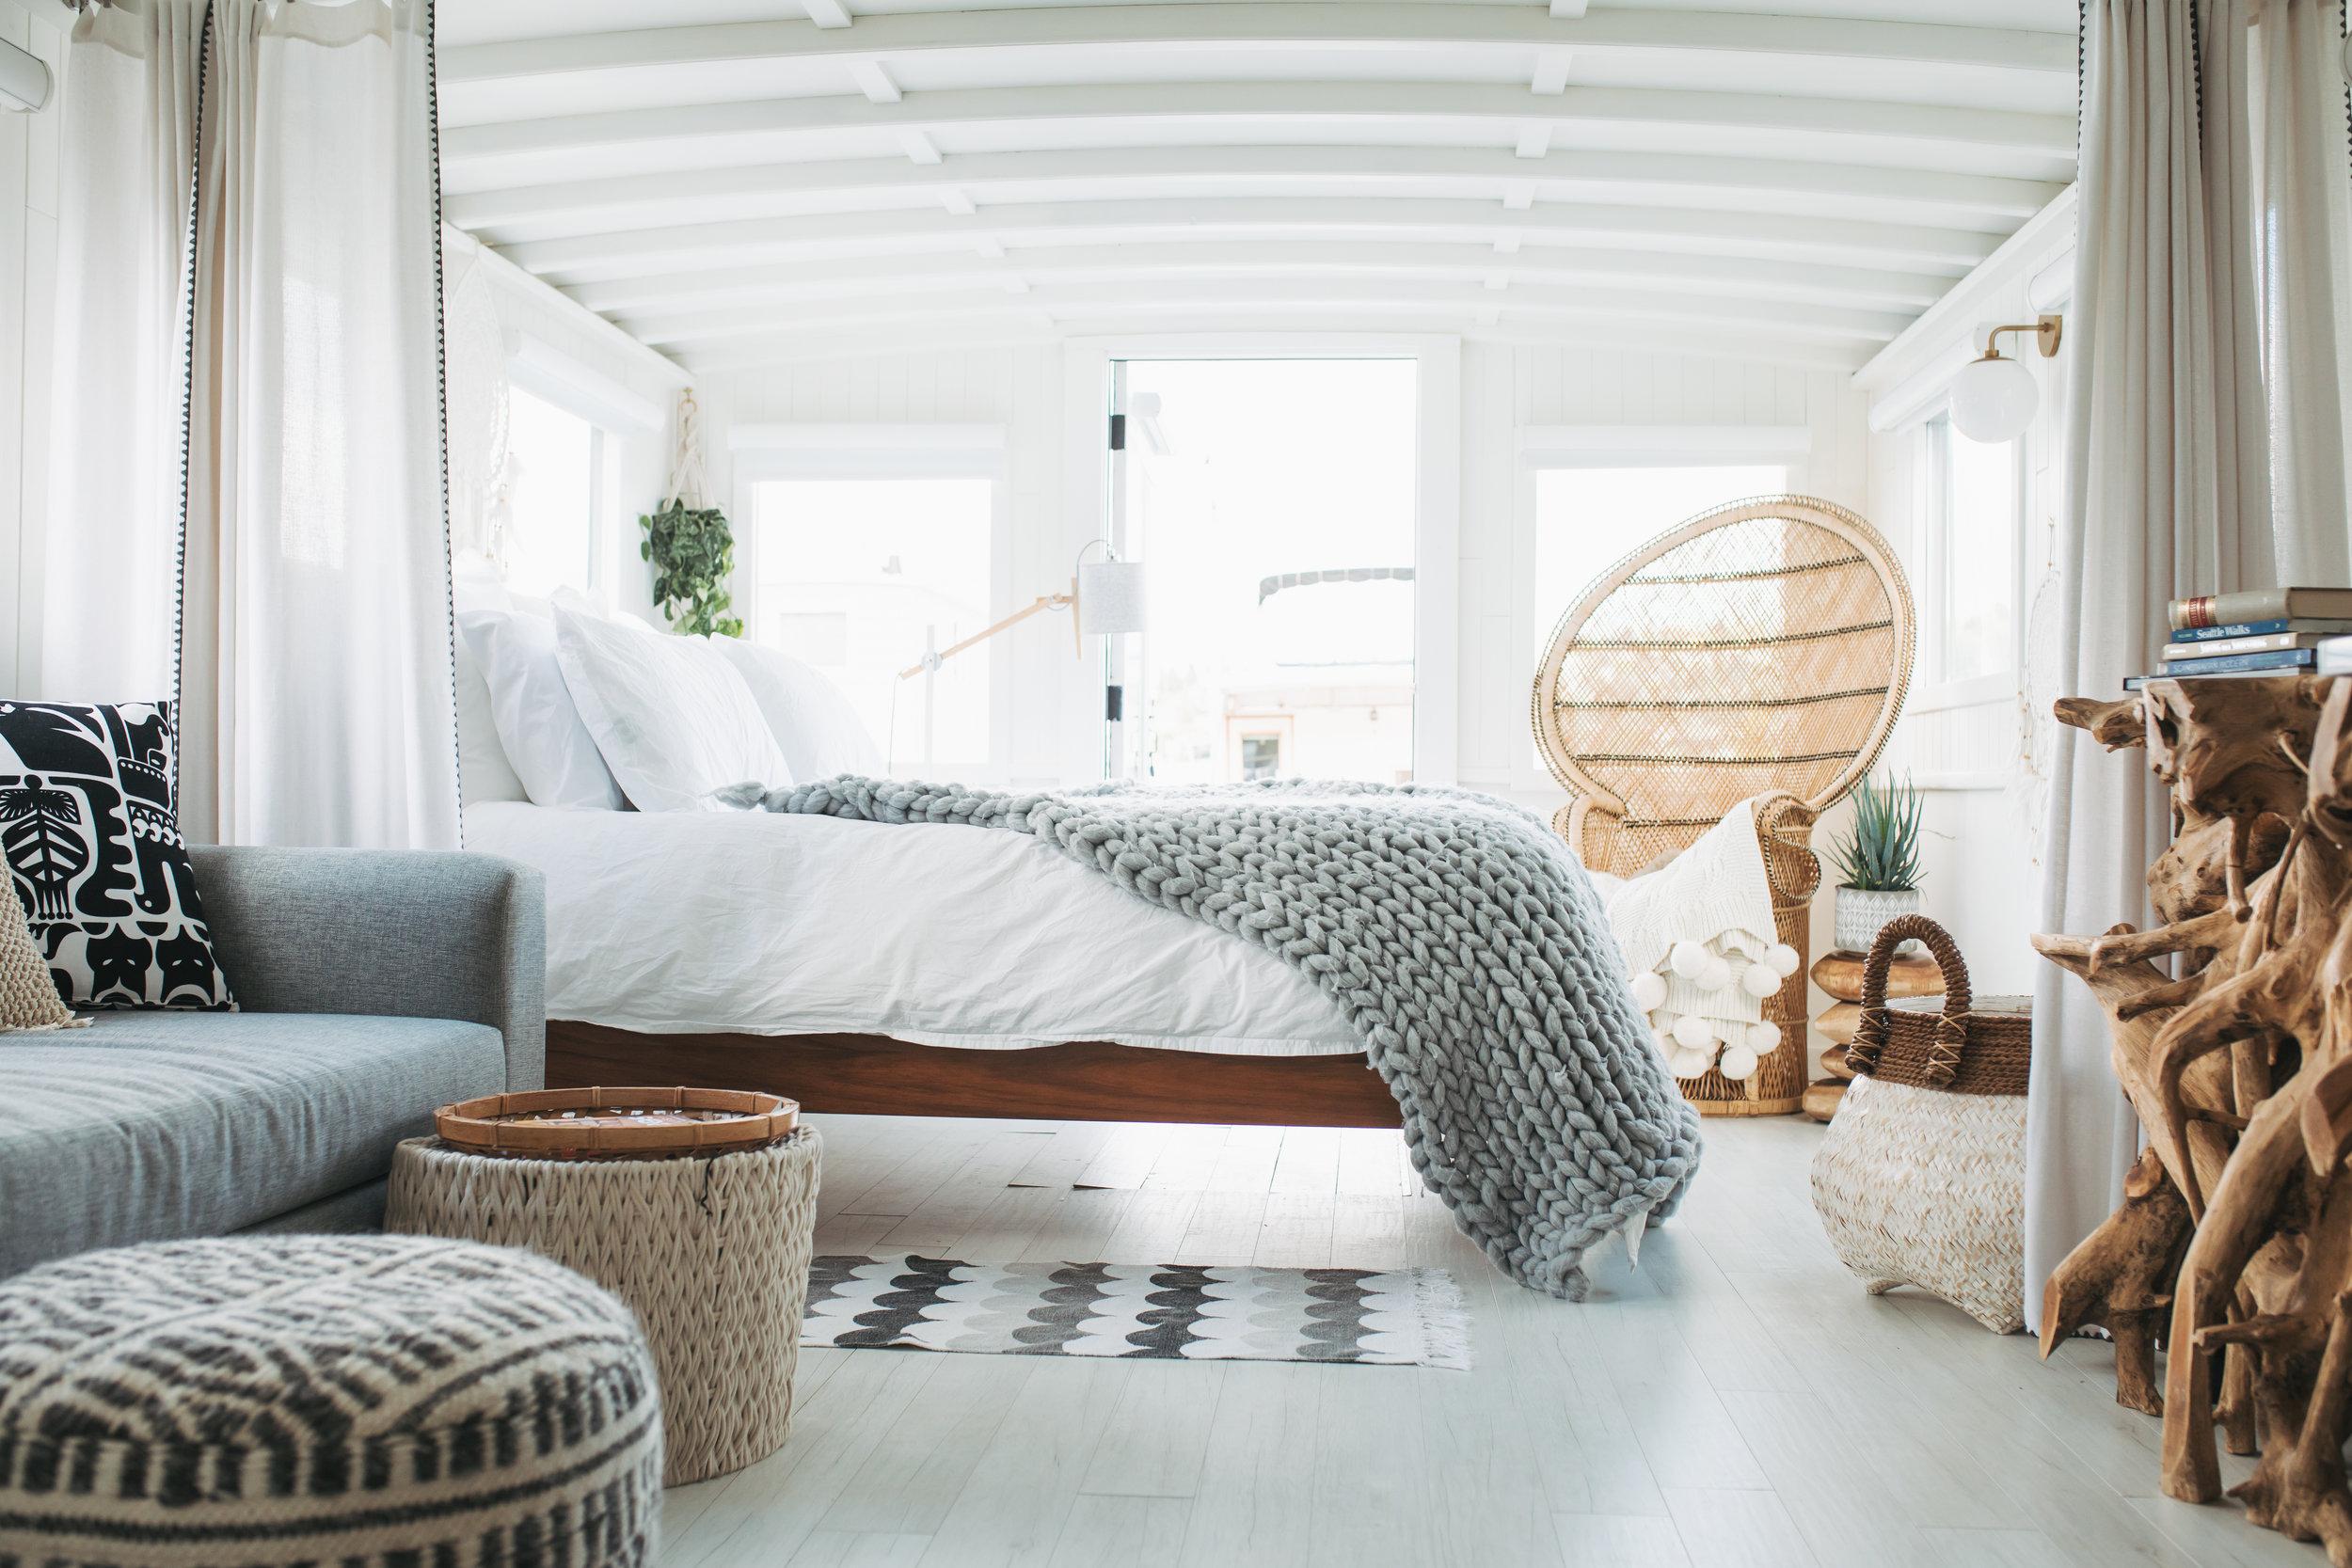 katherine_mendieta_seattle_lakeside_lovenest_houseboat-3.jpg